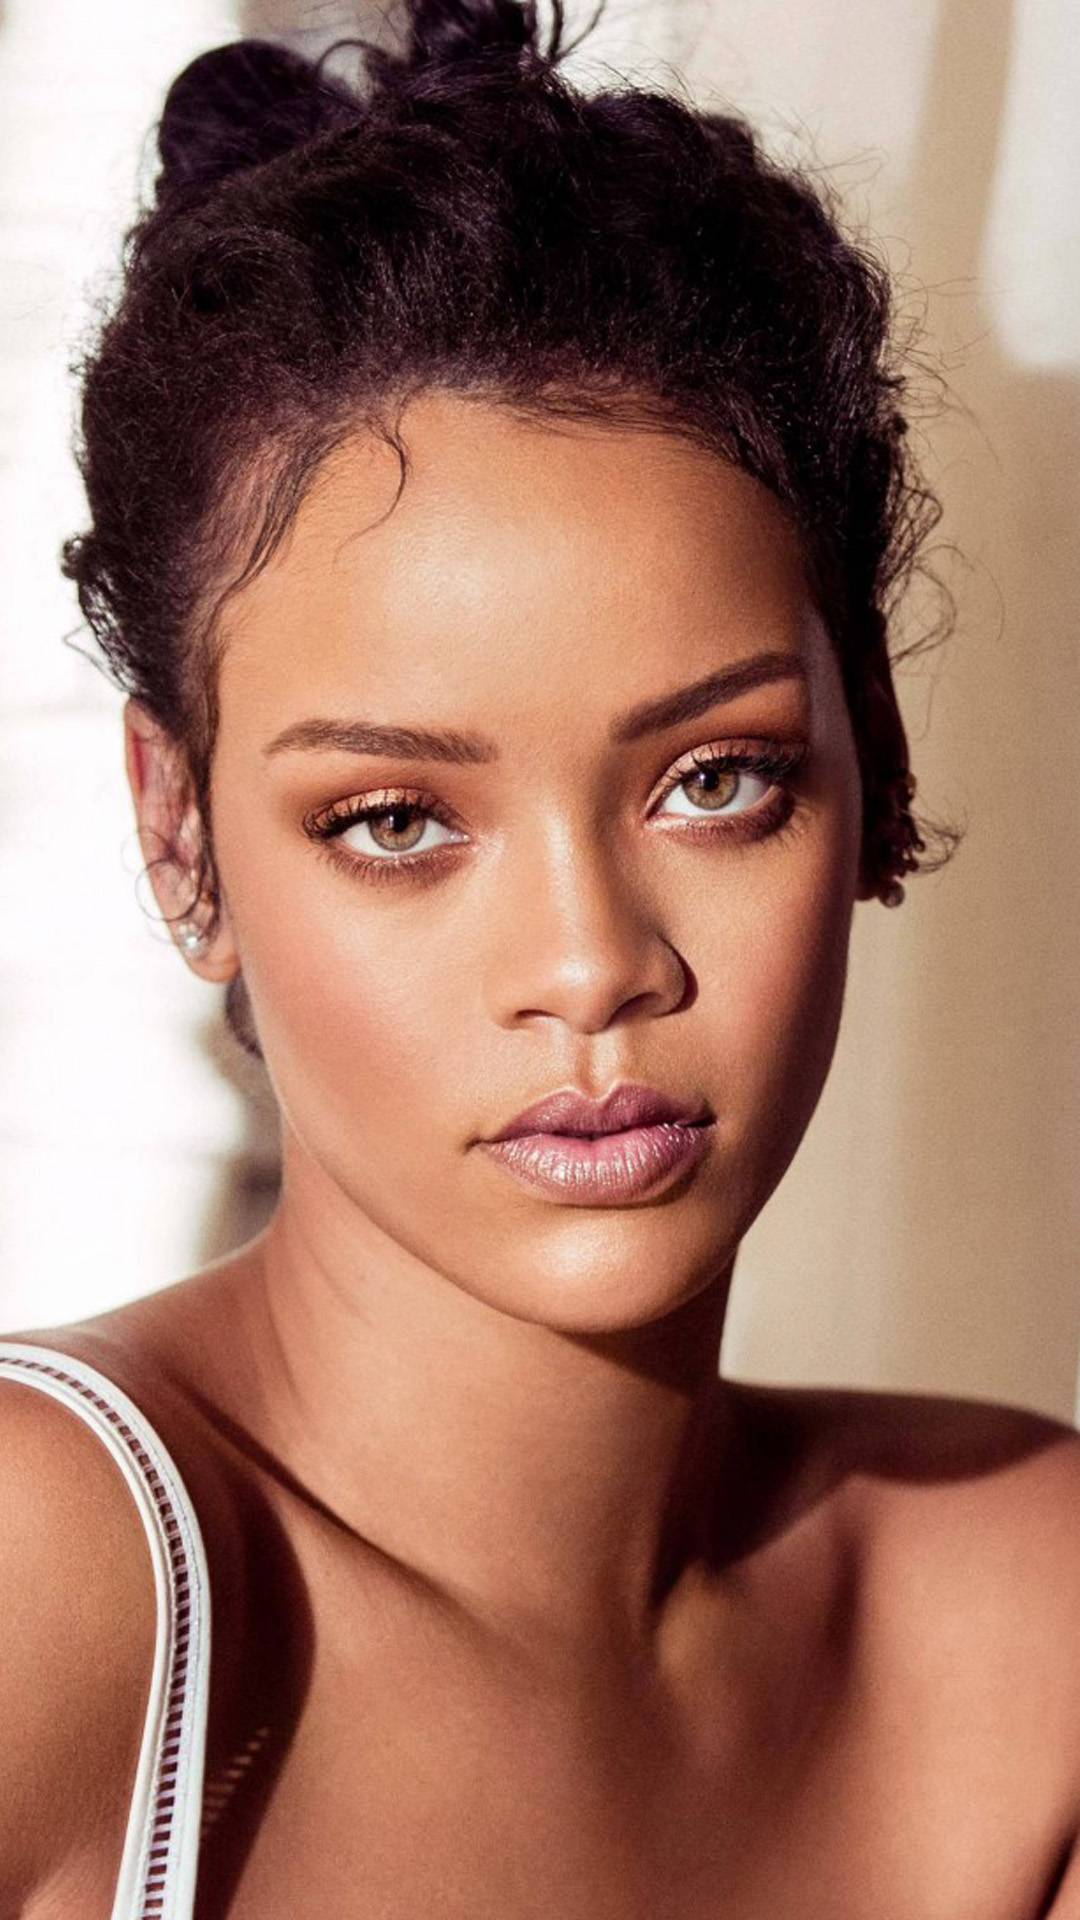 Hd Lock Screen Wallpaper Android Rihanna 2018 Download Free Pure 4k Amp Ultra Hd Mobile